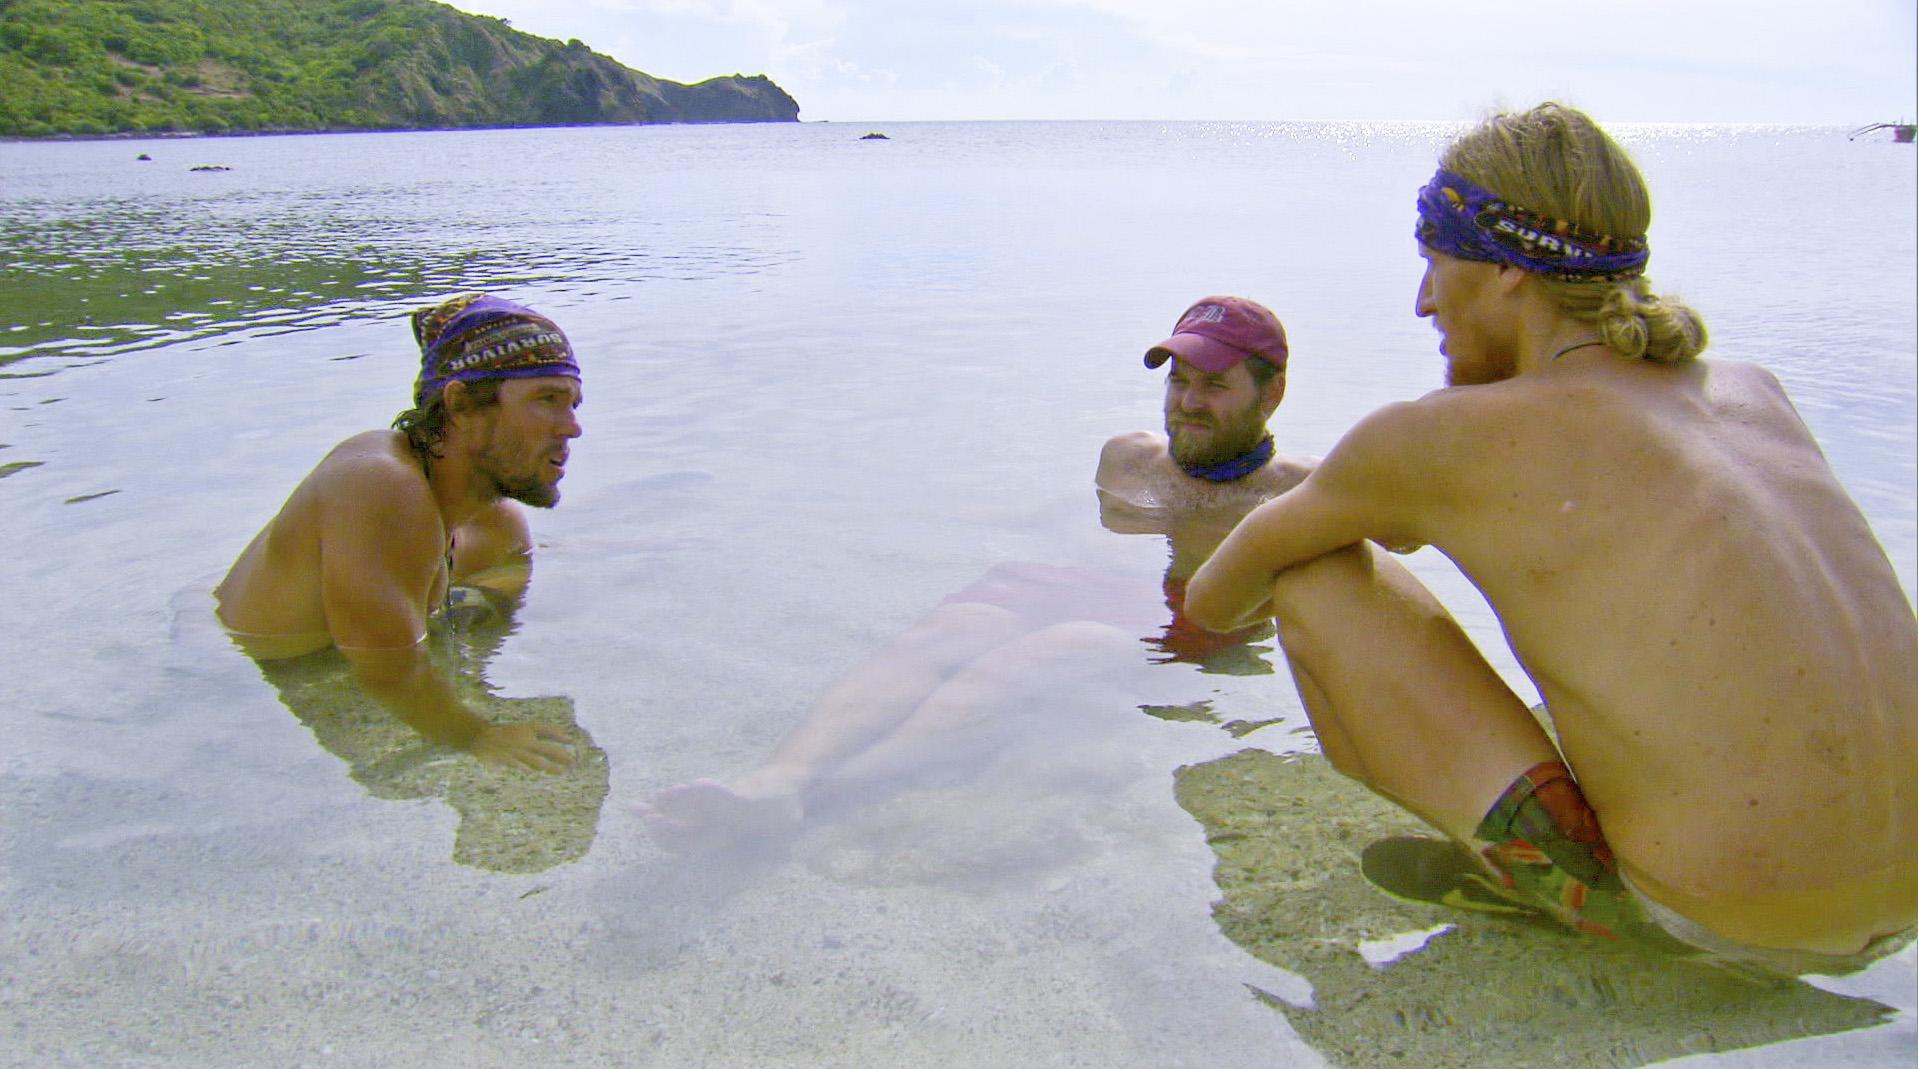 Guys chat in Season 27 Episode 10